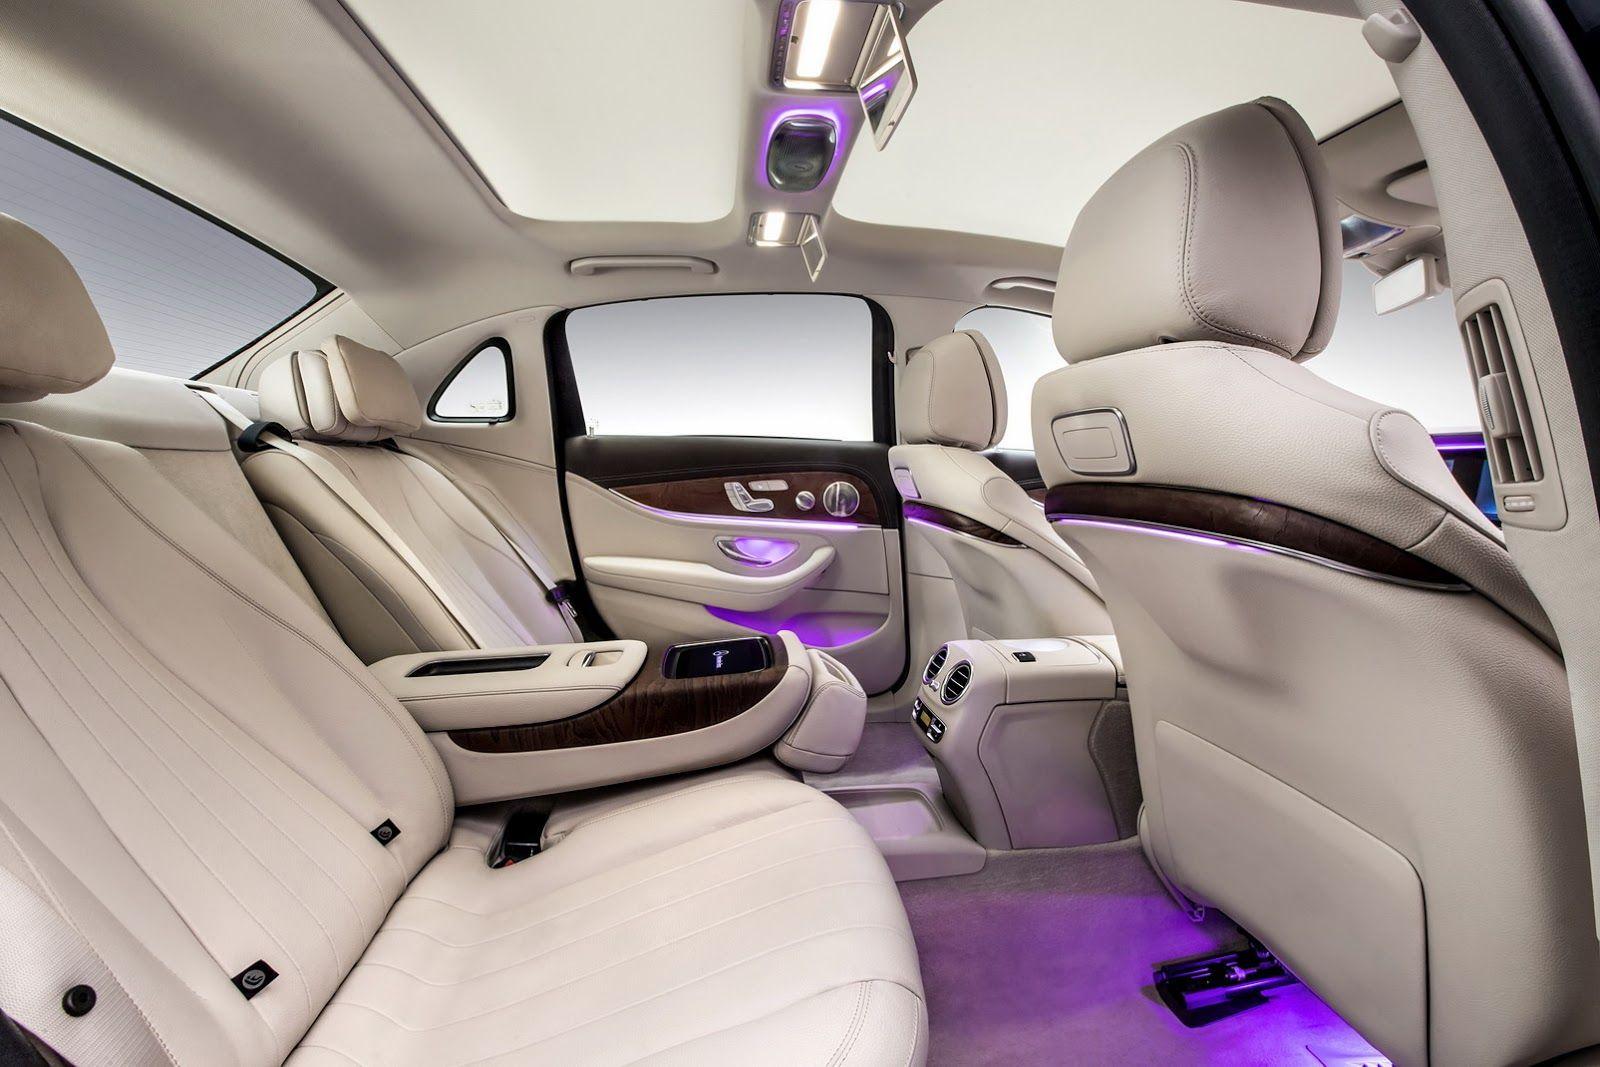 China S New Mercedes Benz E Class Lwb Looks Like A Mini Maybach Carscoops Benz E Super Luxury Cars Benz E Class